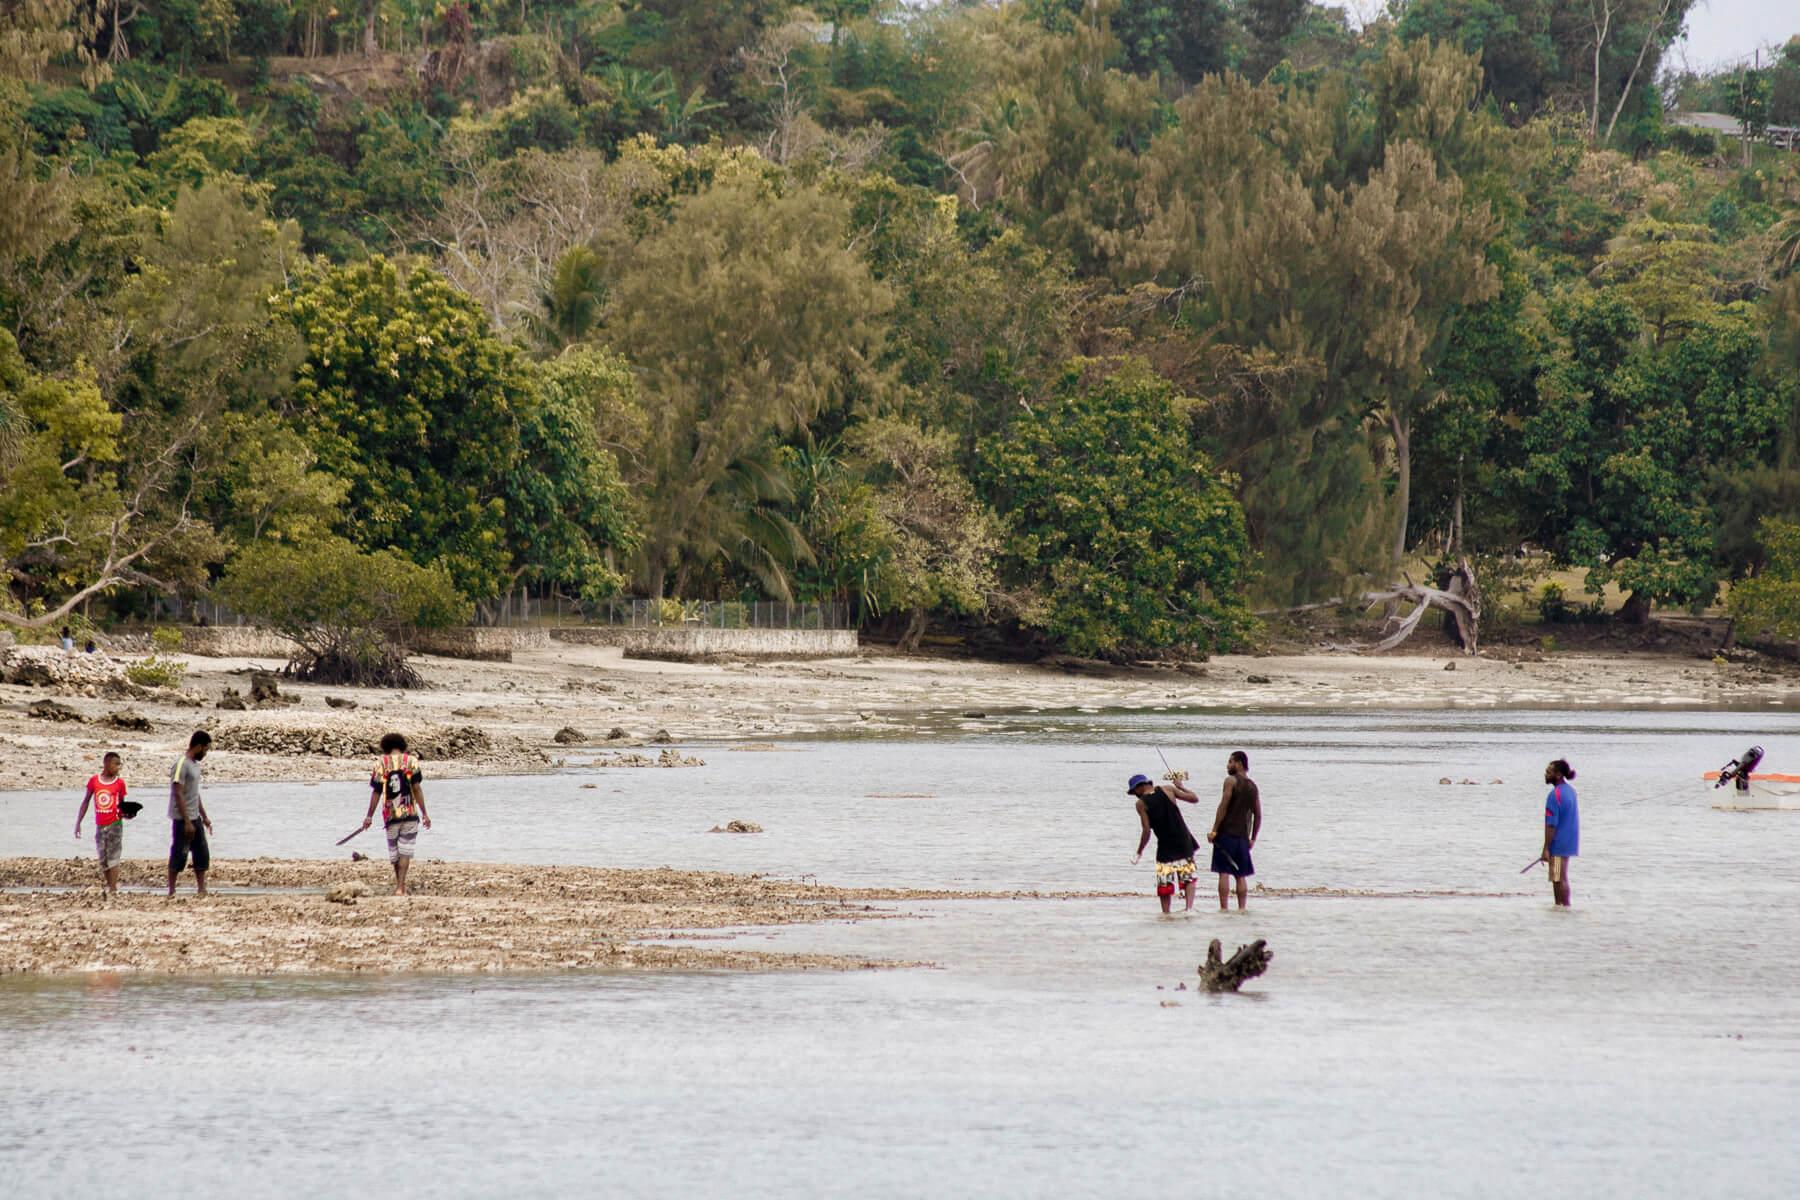 A group of Vanuatu locals enjoying the beach